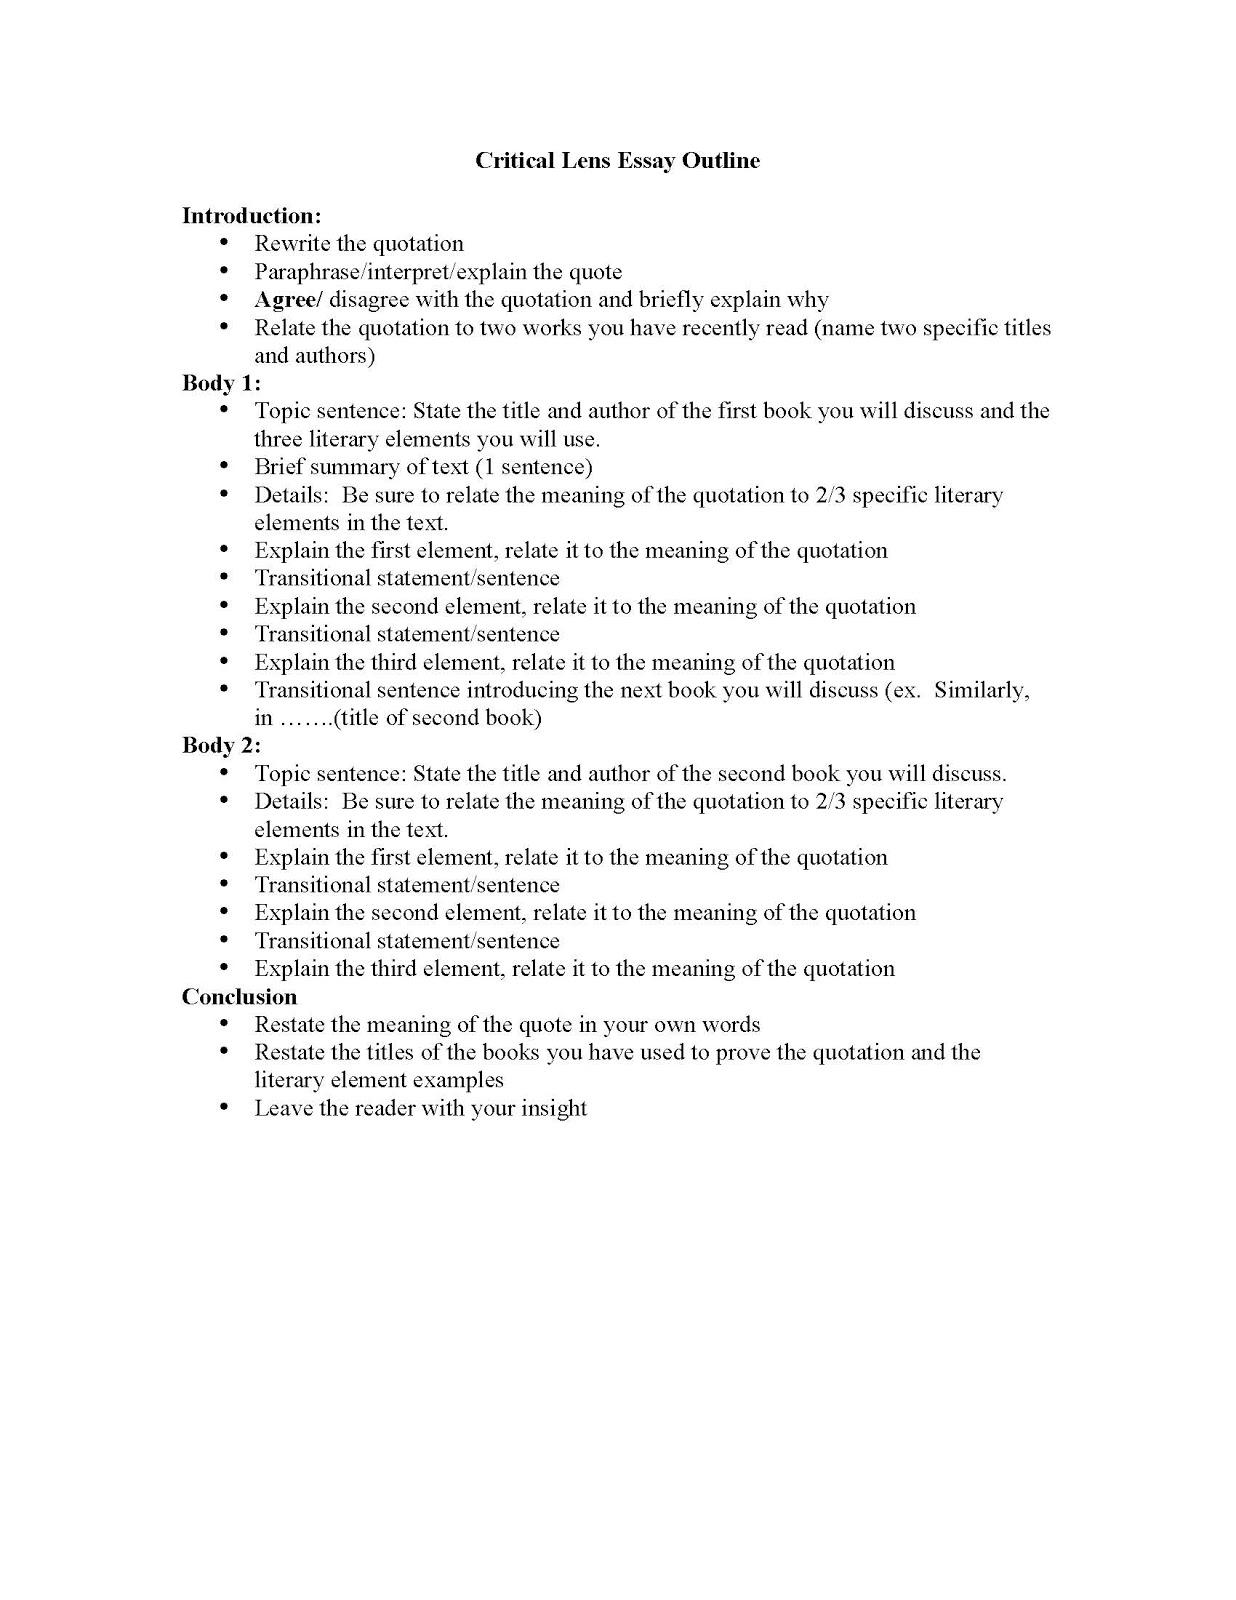 002 Essay Example Outline Of Criticallensessayoutlineandliterayelements Page 1 Impressive Argumentative Sample Mla Format Full